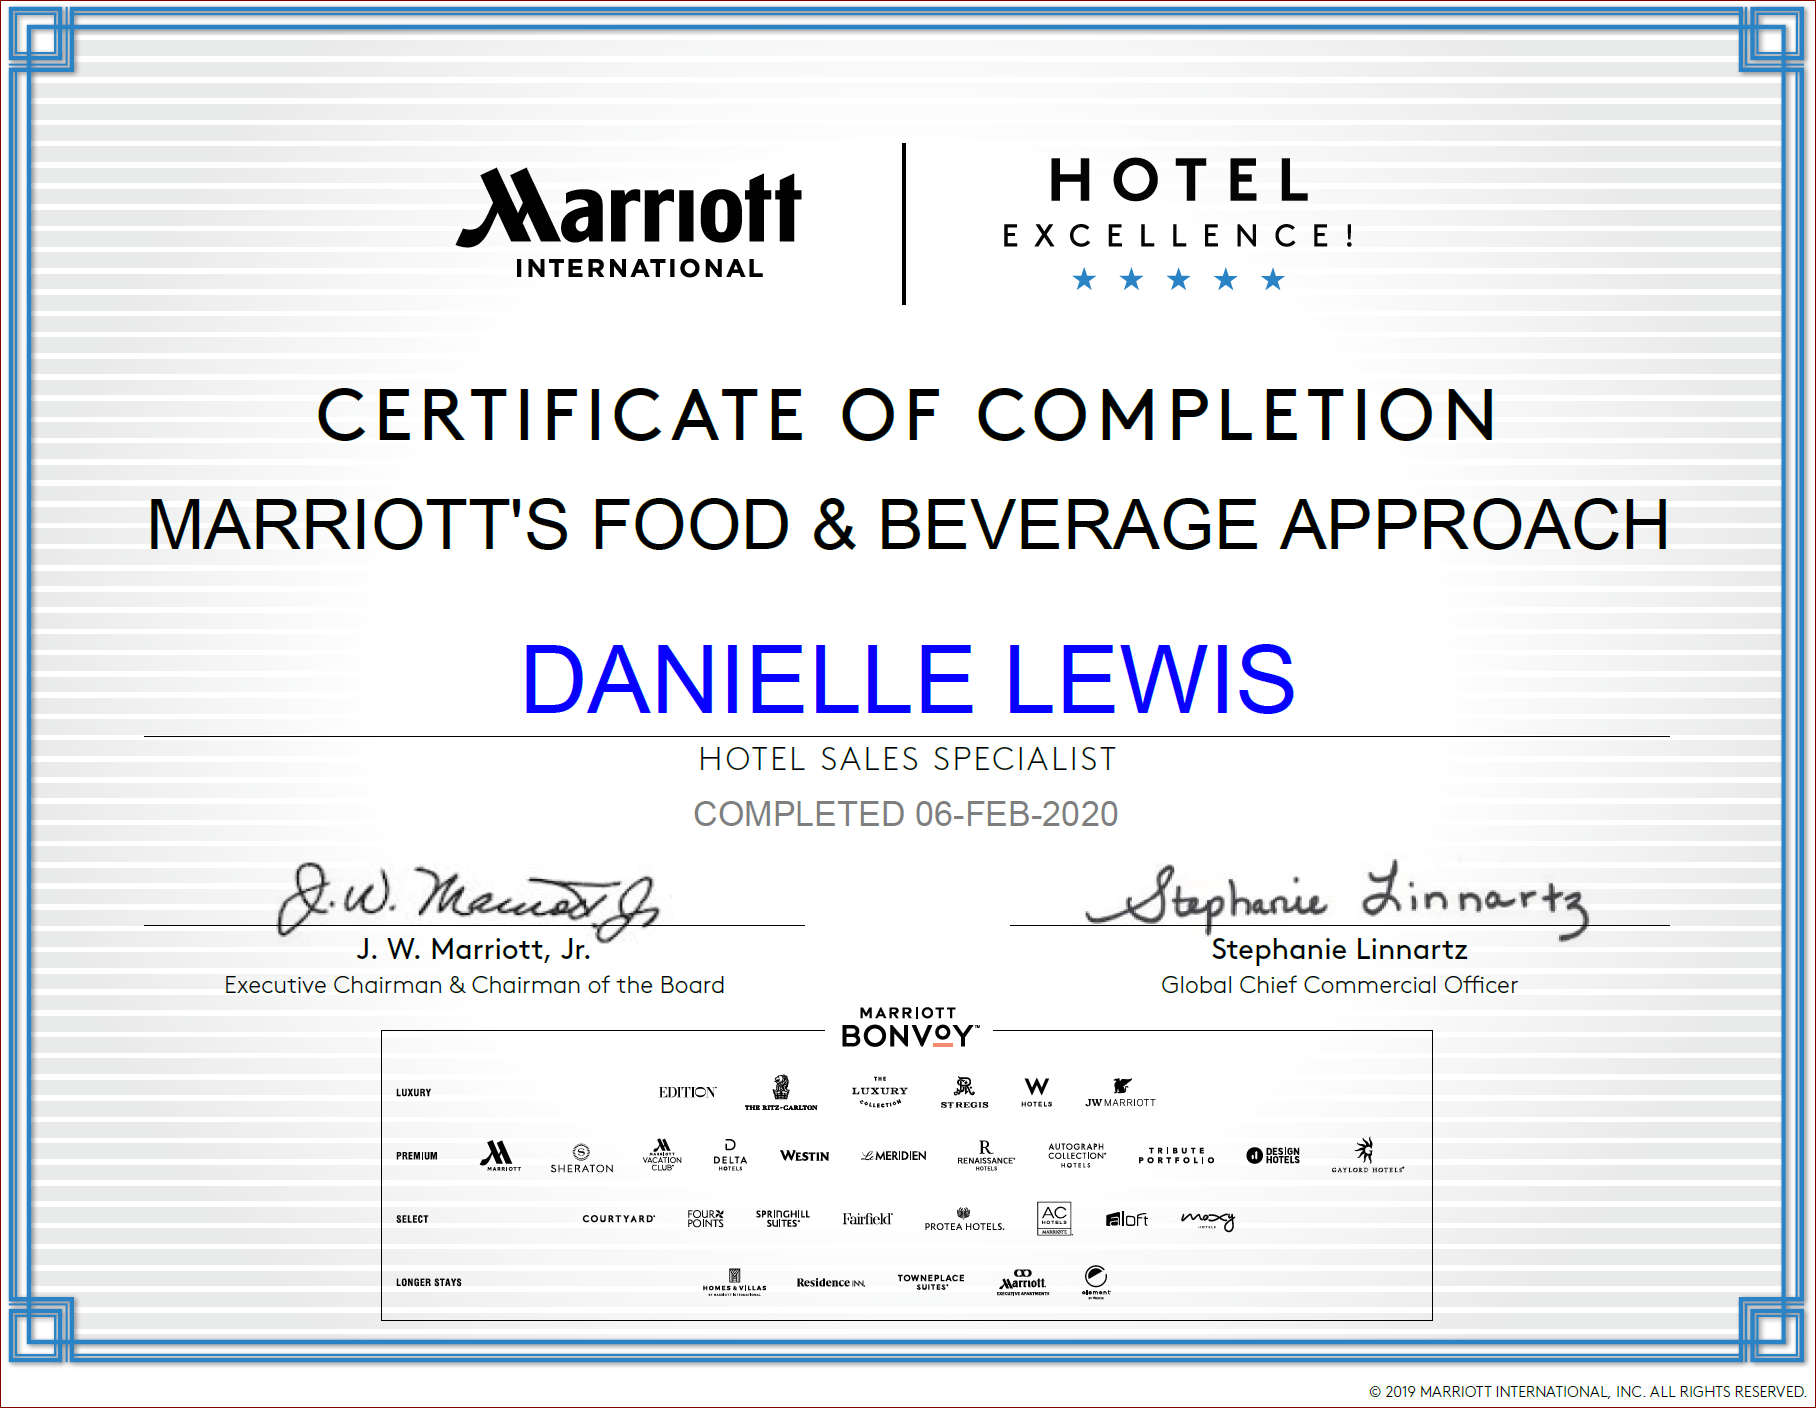 SelfishMe Travel - Marriott International Food & Beverage Approach Certificate